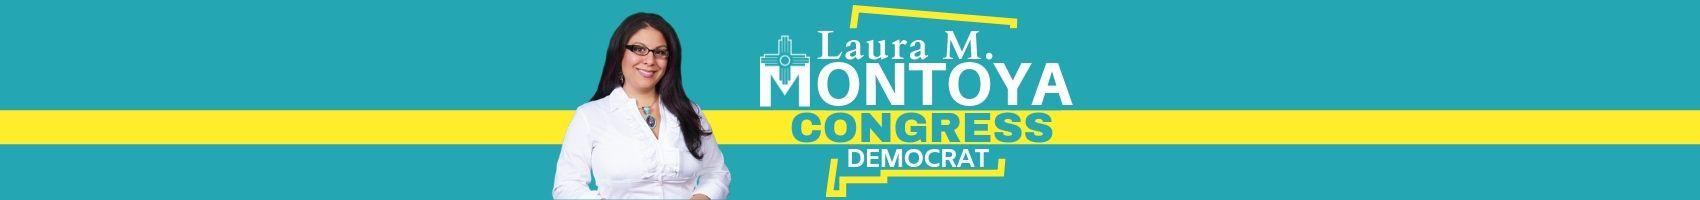 Laura Montoya